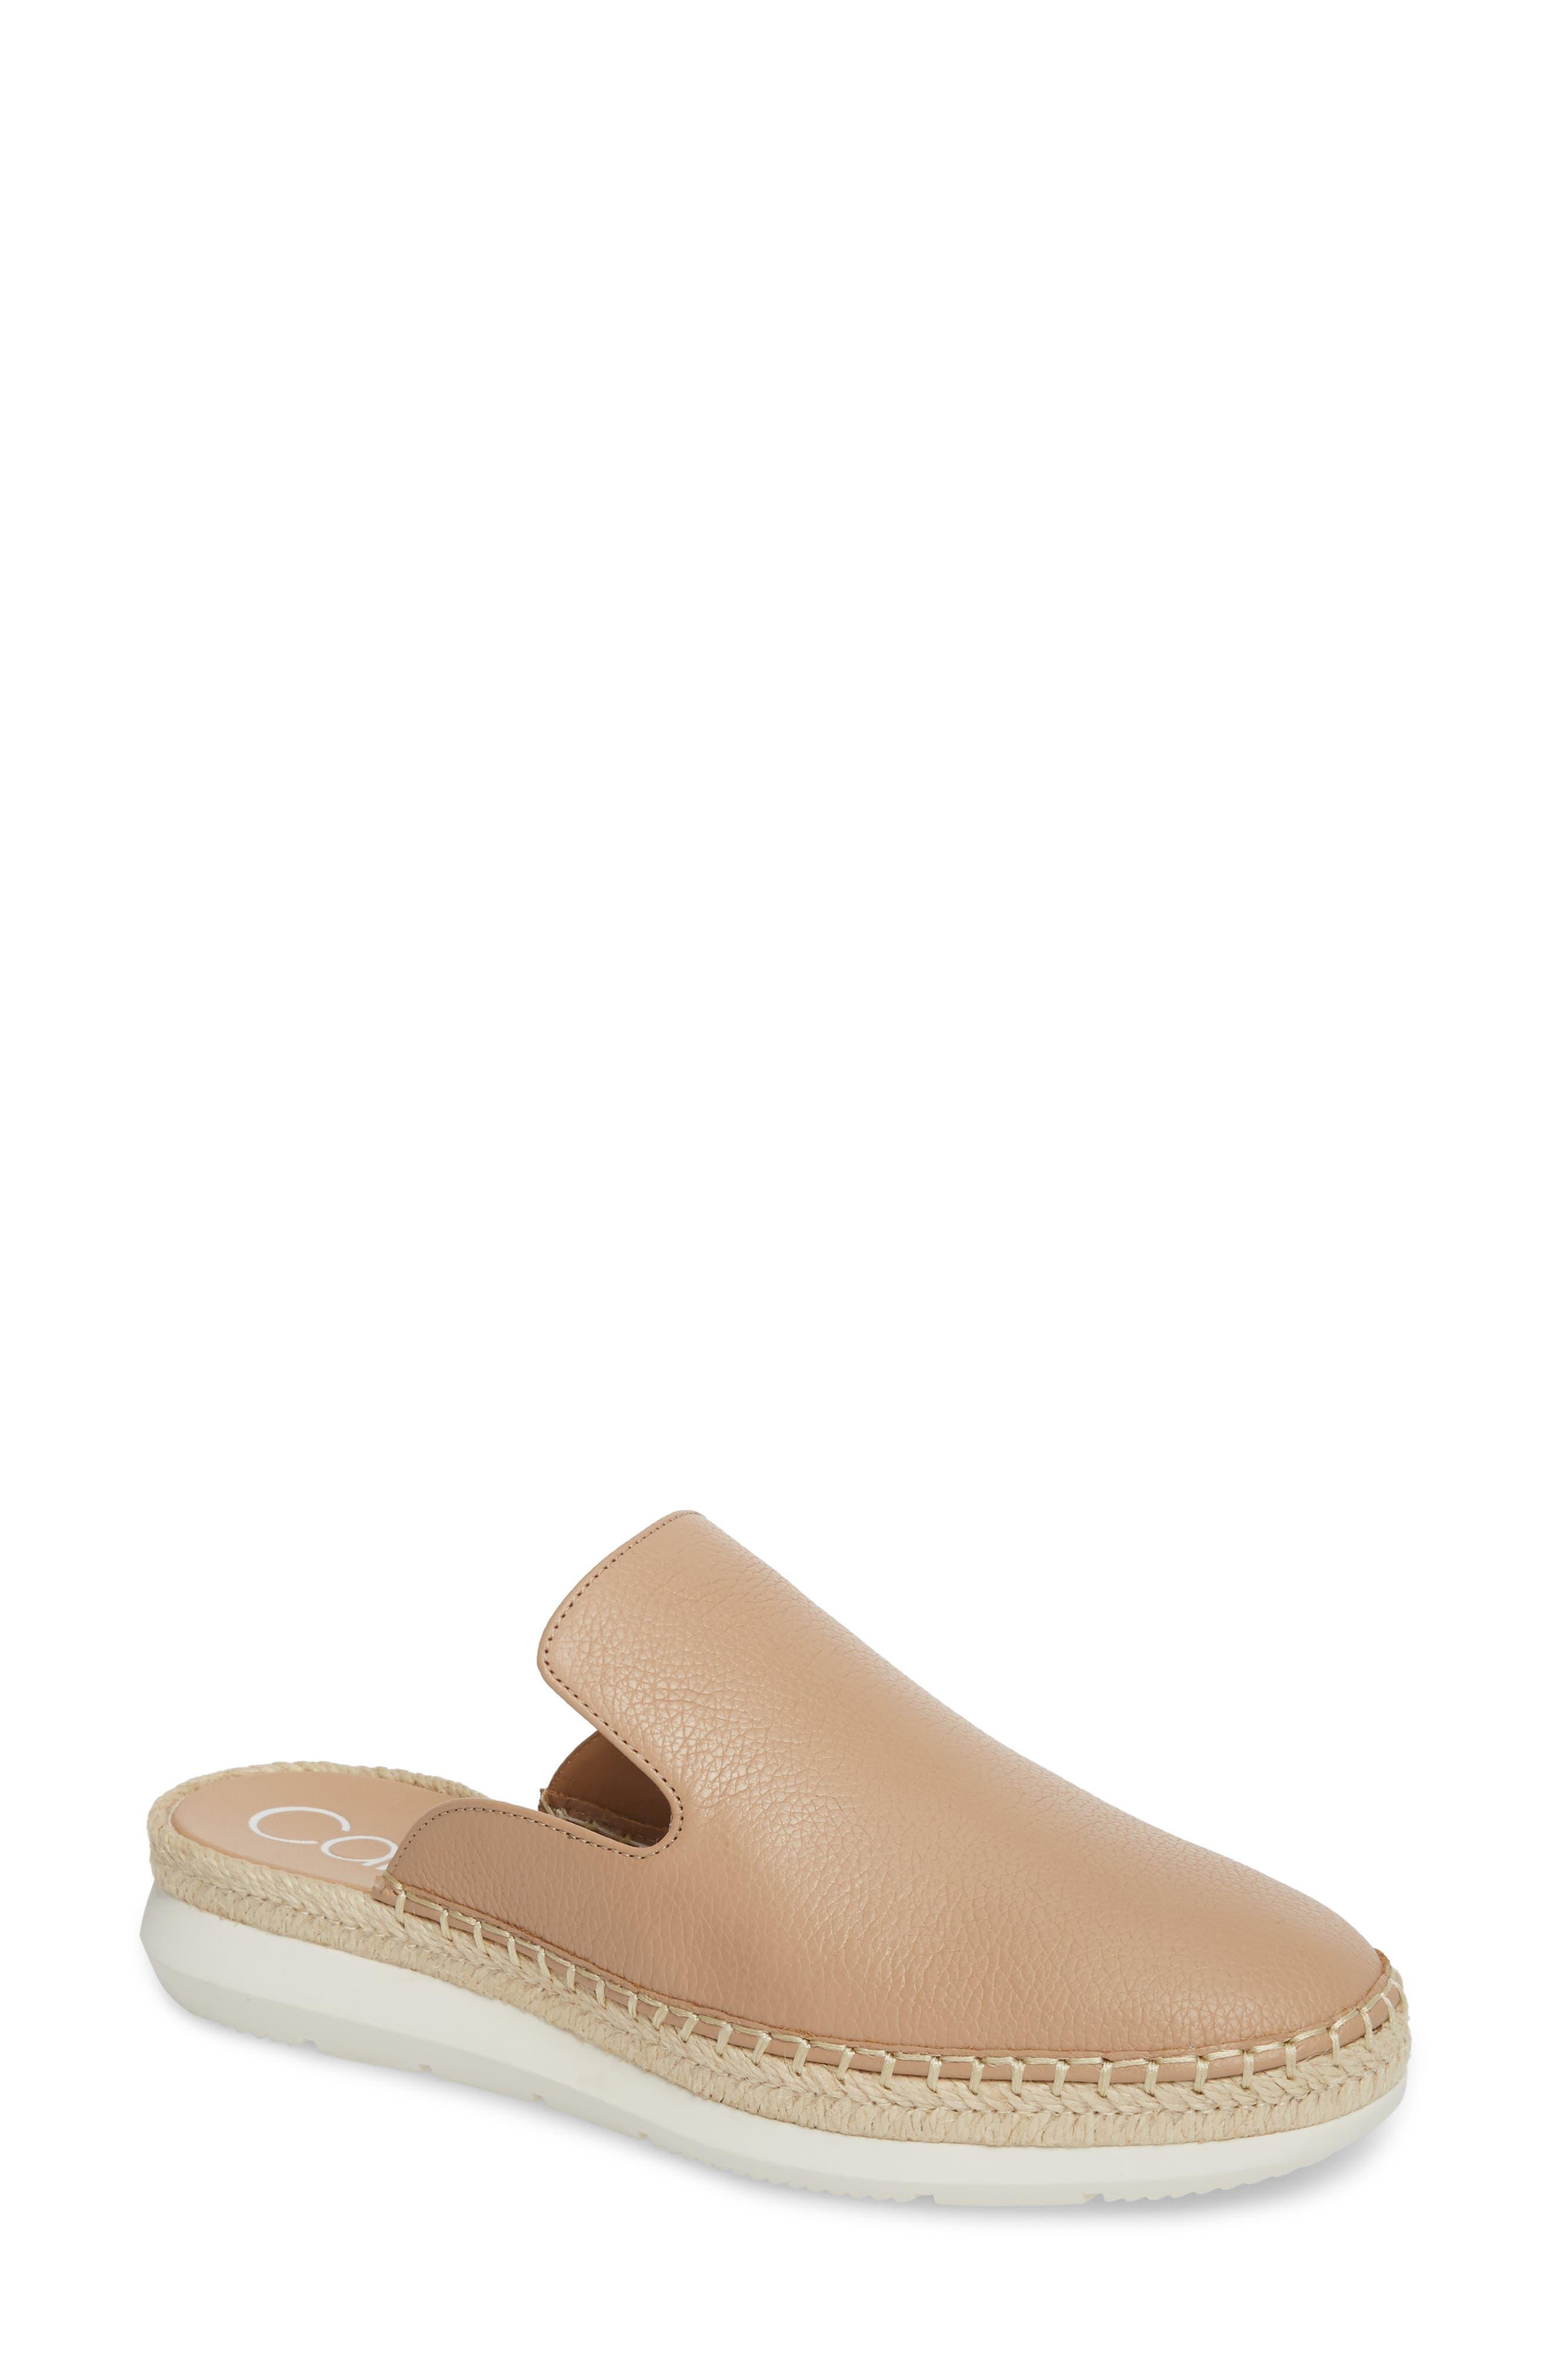 Verie Espadrille Loafer Mule,                         Main,                         color, DESERT SAND PEBBLE LEATHER